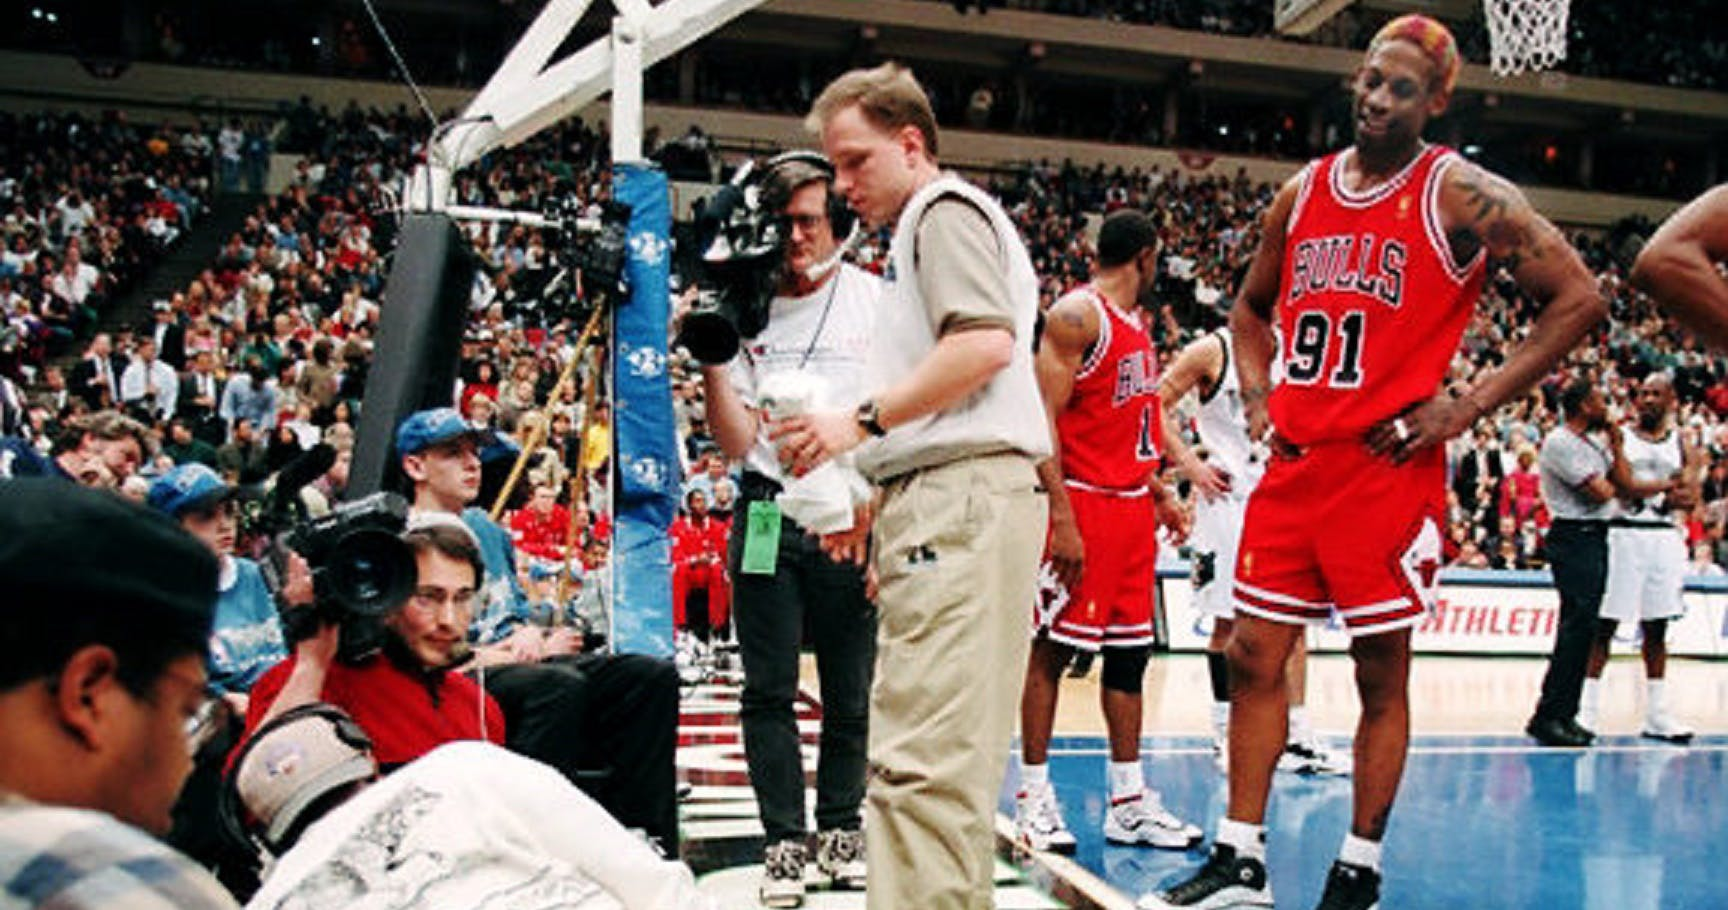 Dennis Rodman coup de pied cameraman